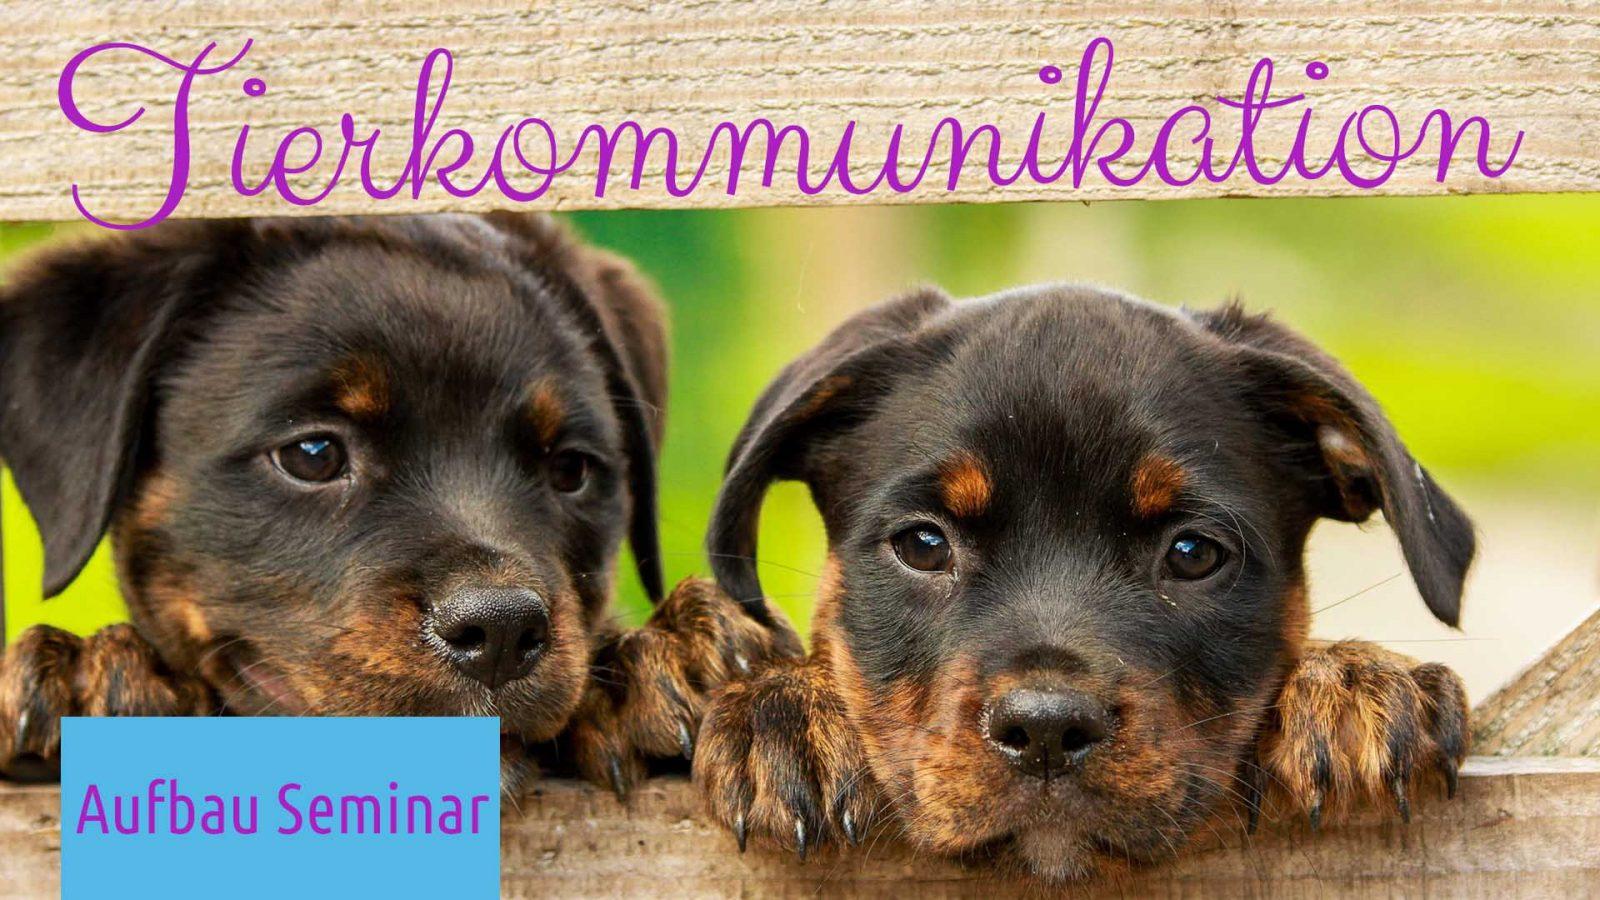 Aufbau Seminar Tierkommunikation